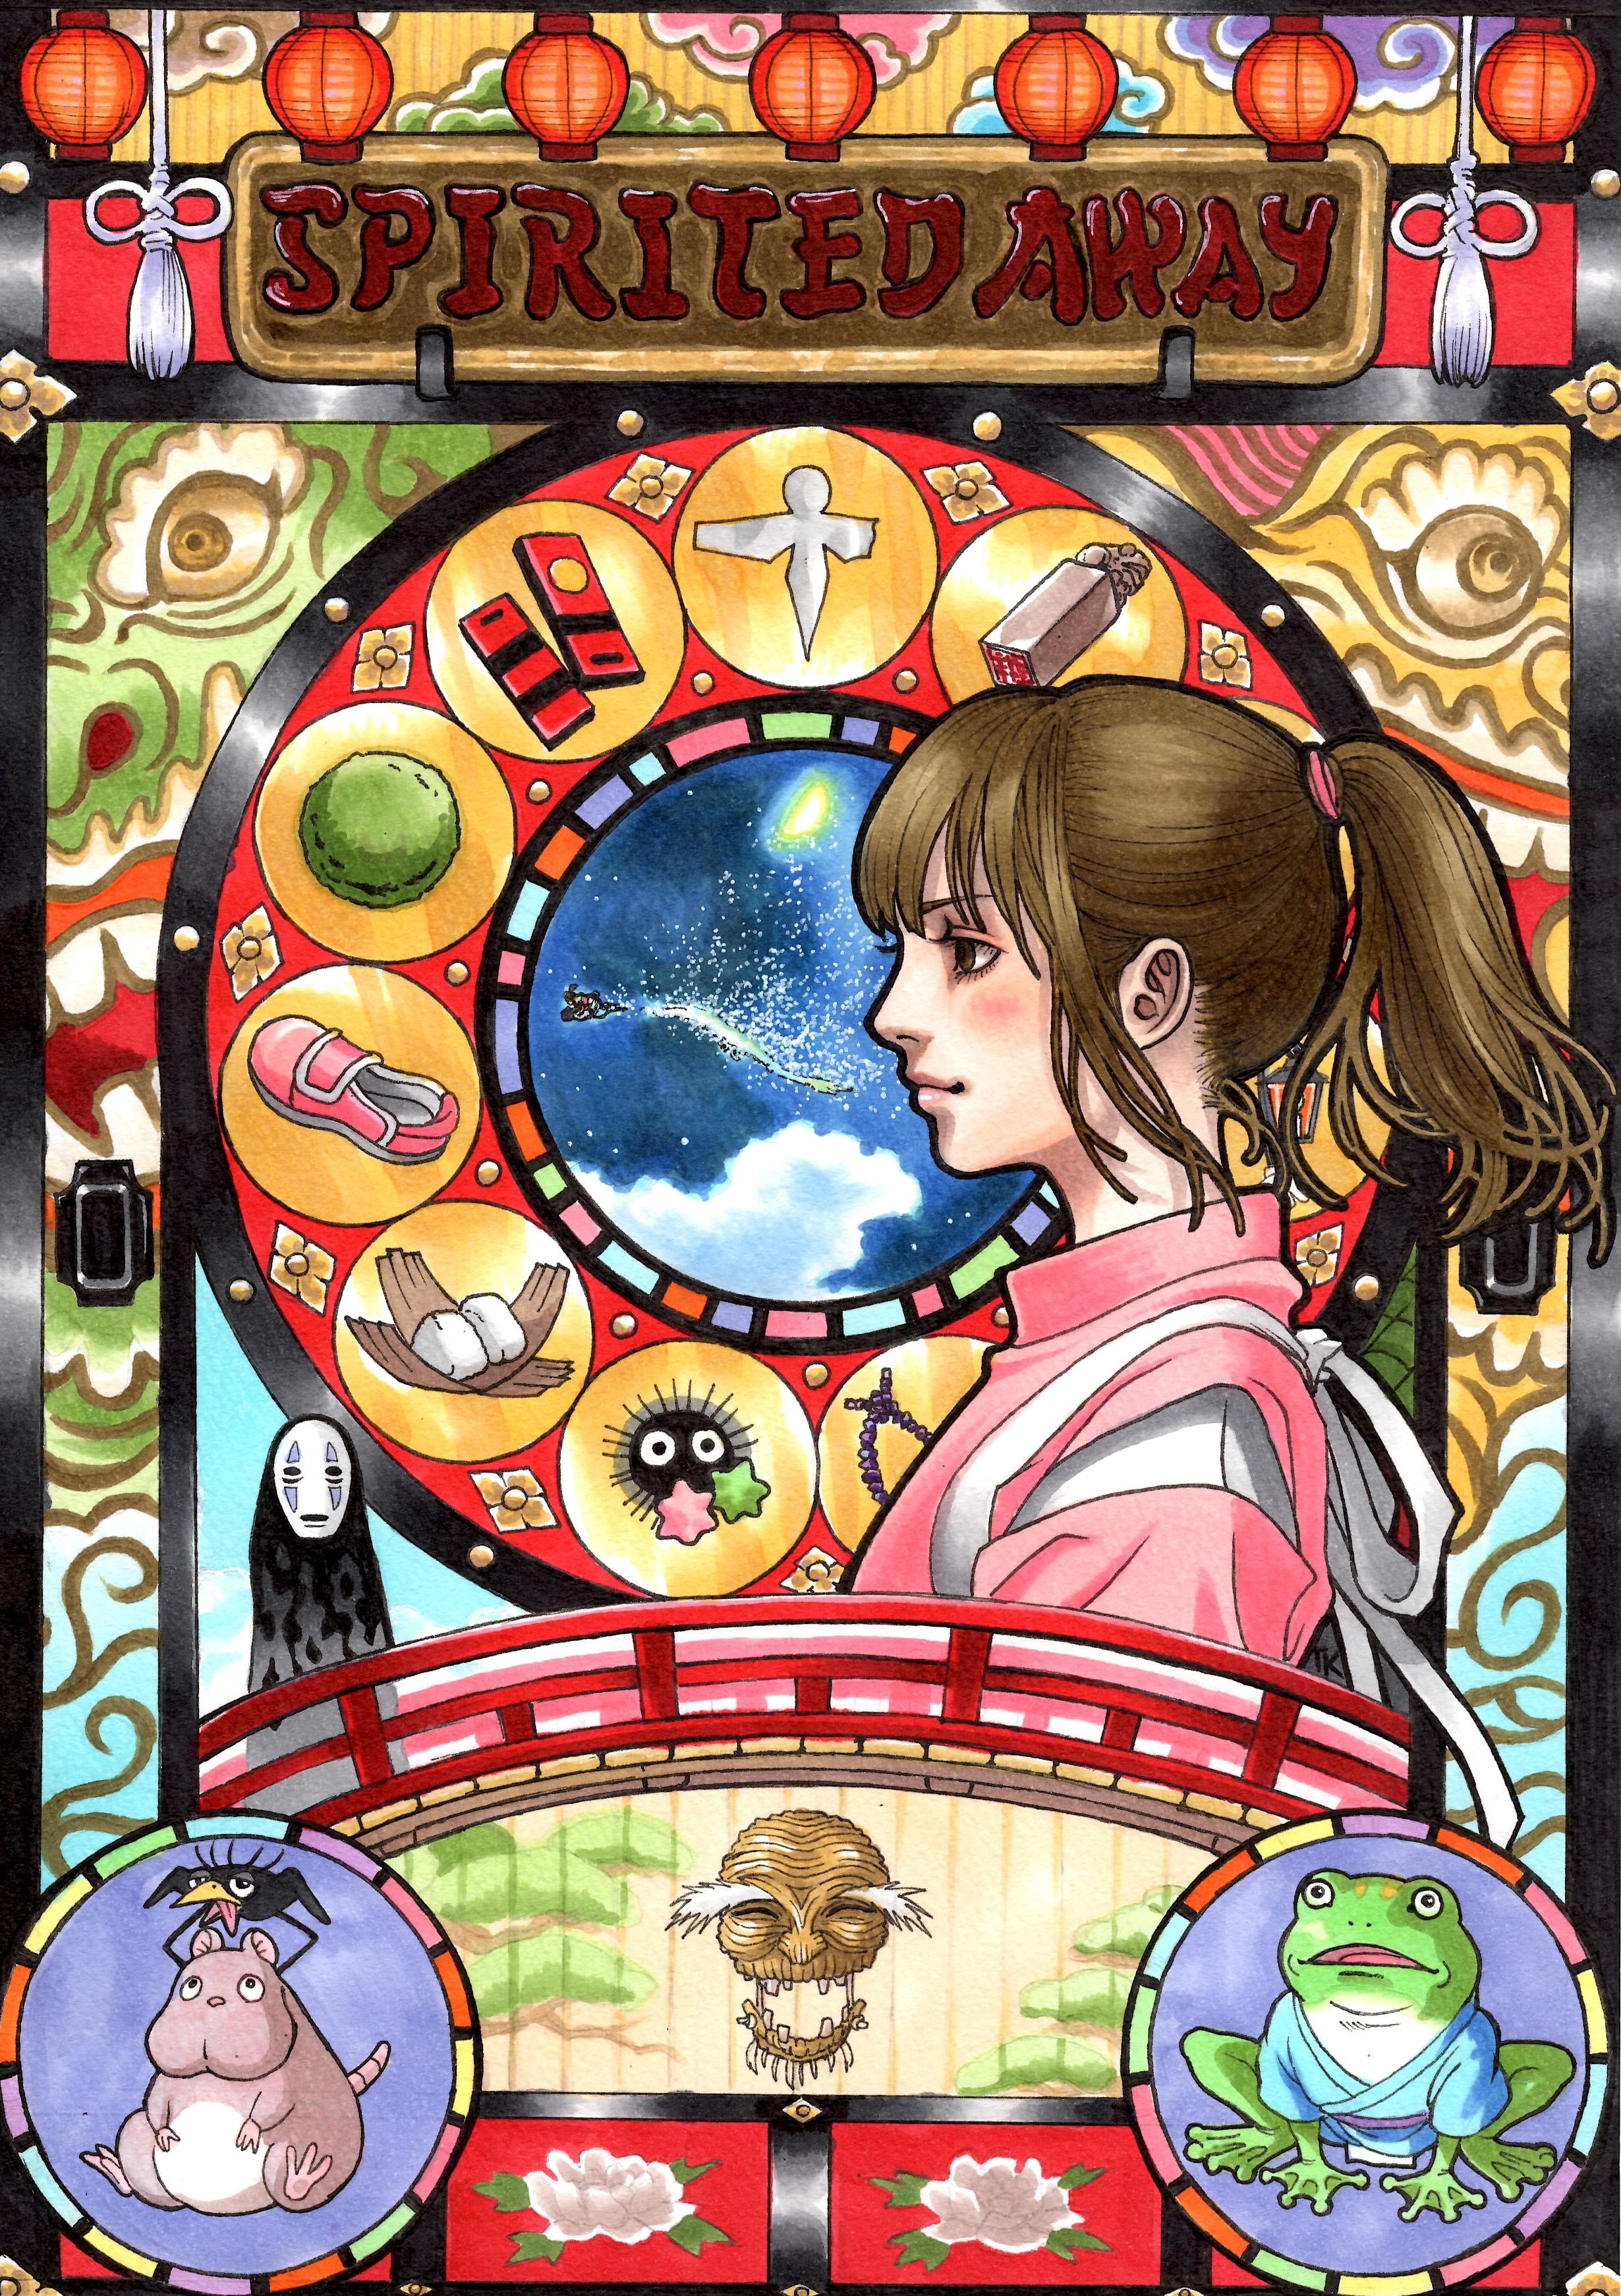 Art-Nouveau-Ghibli-Voyage-Chihiro